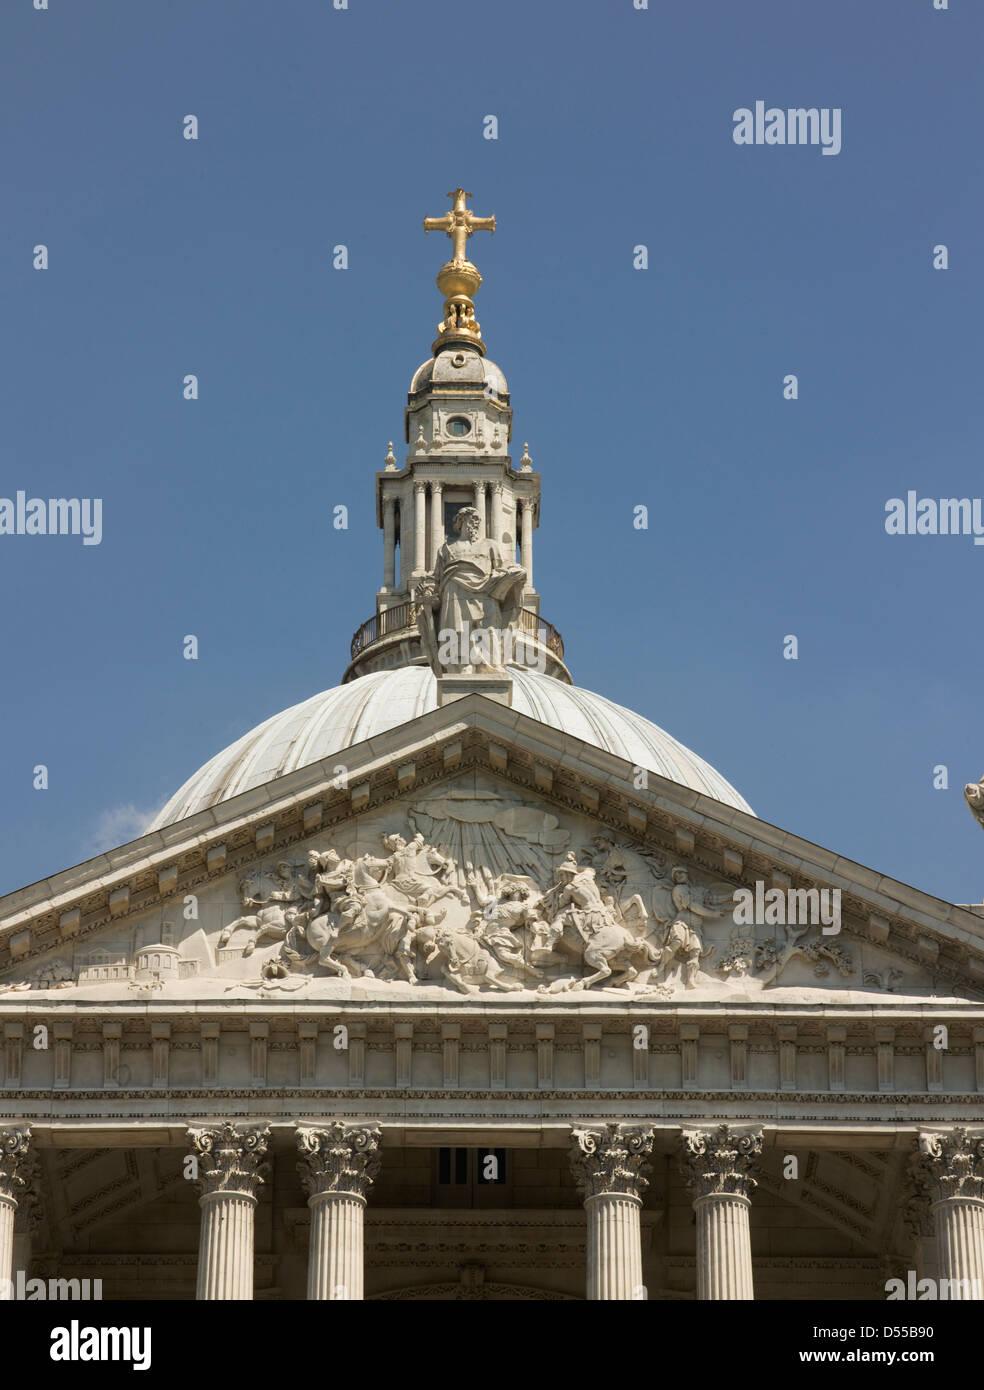 Saint Paul's Cathedral, London, pediment and lantern Stock Photo